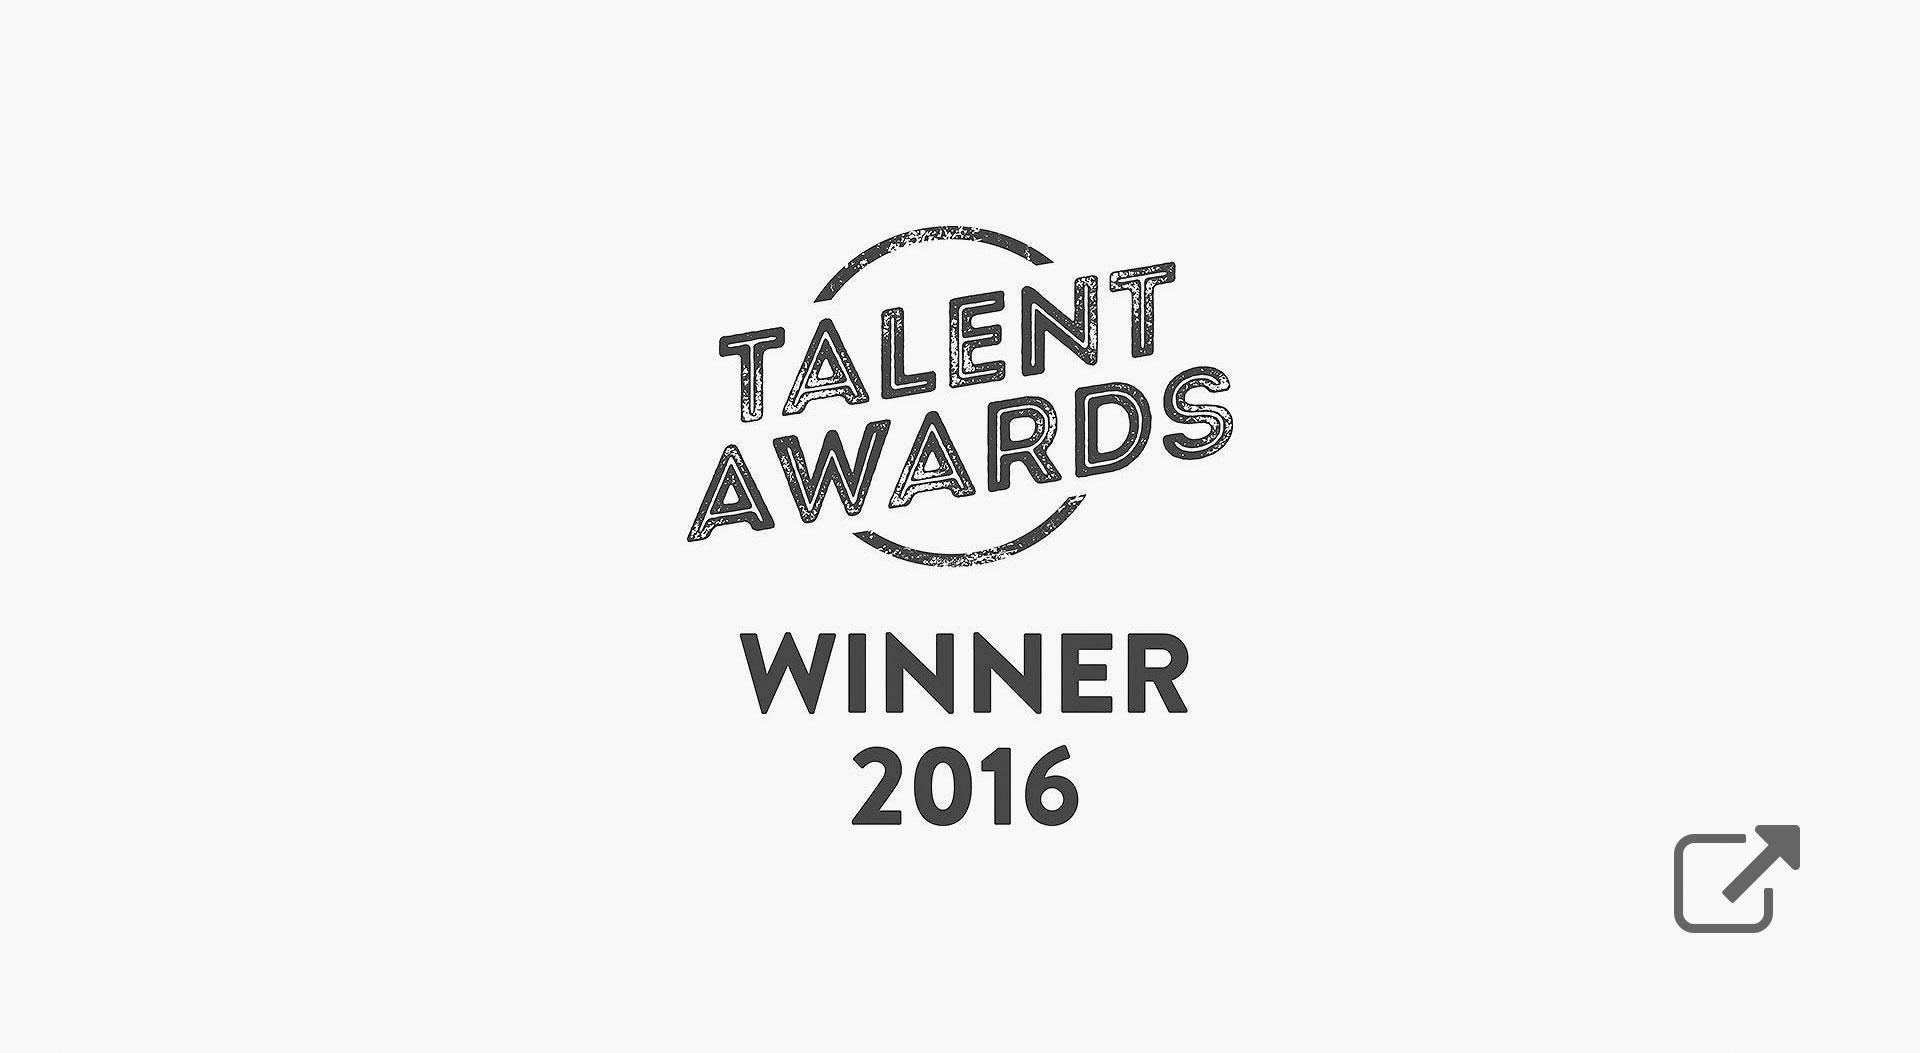 aquent talent awards winner 2016